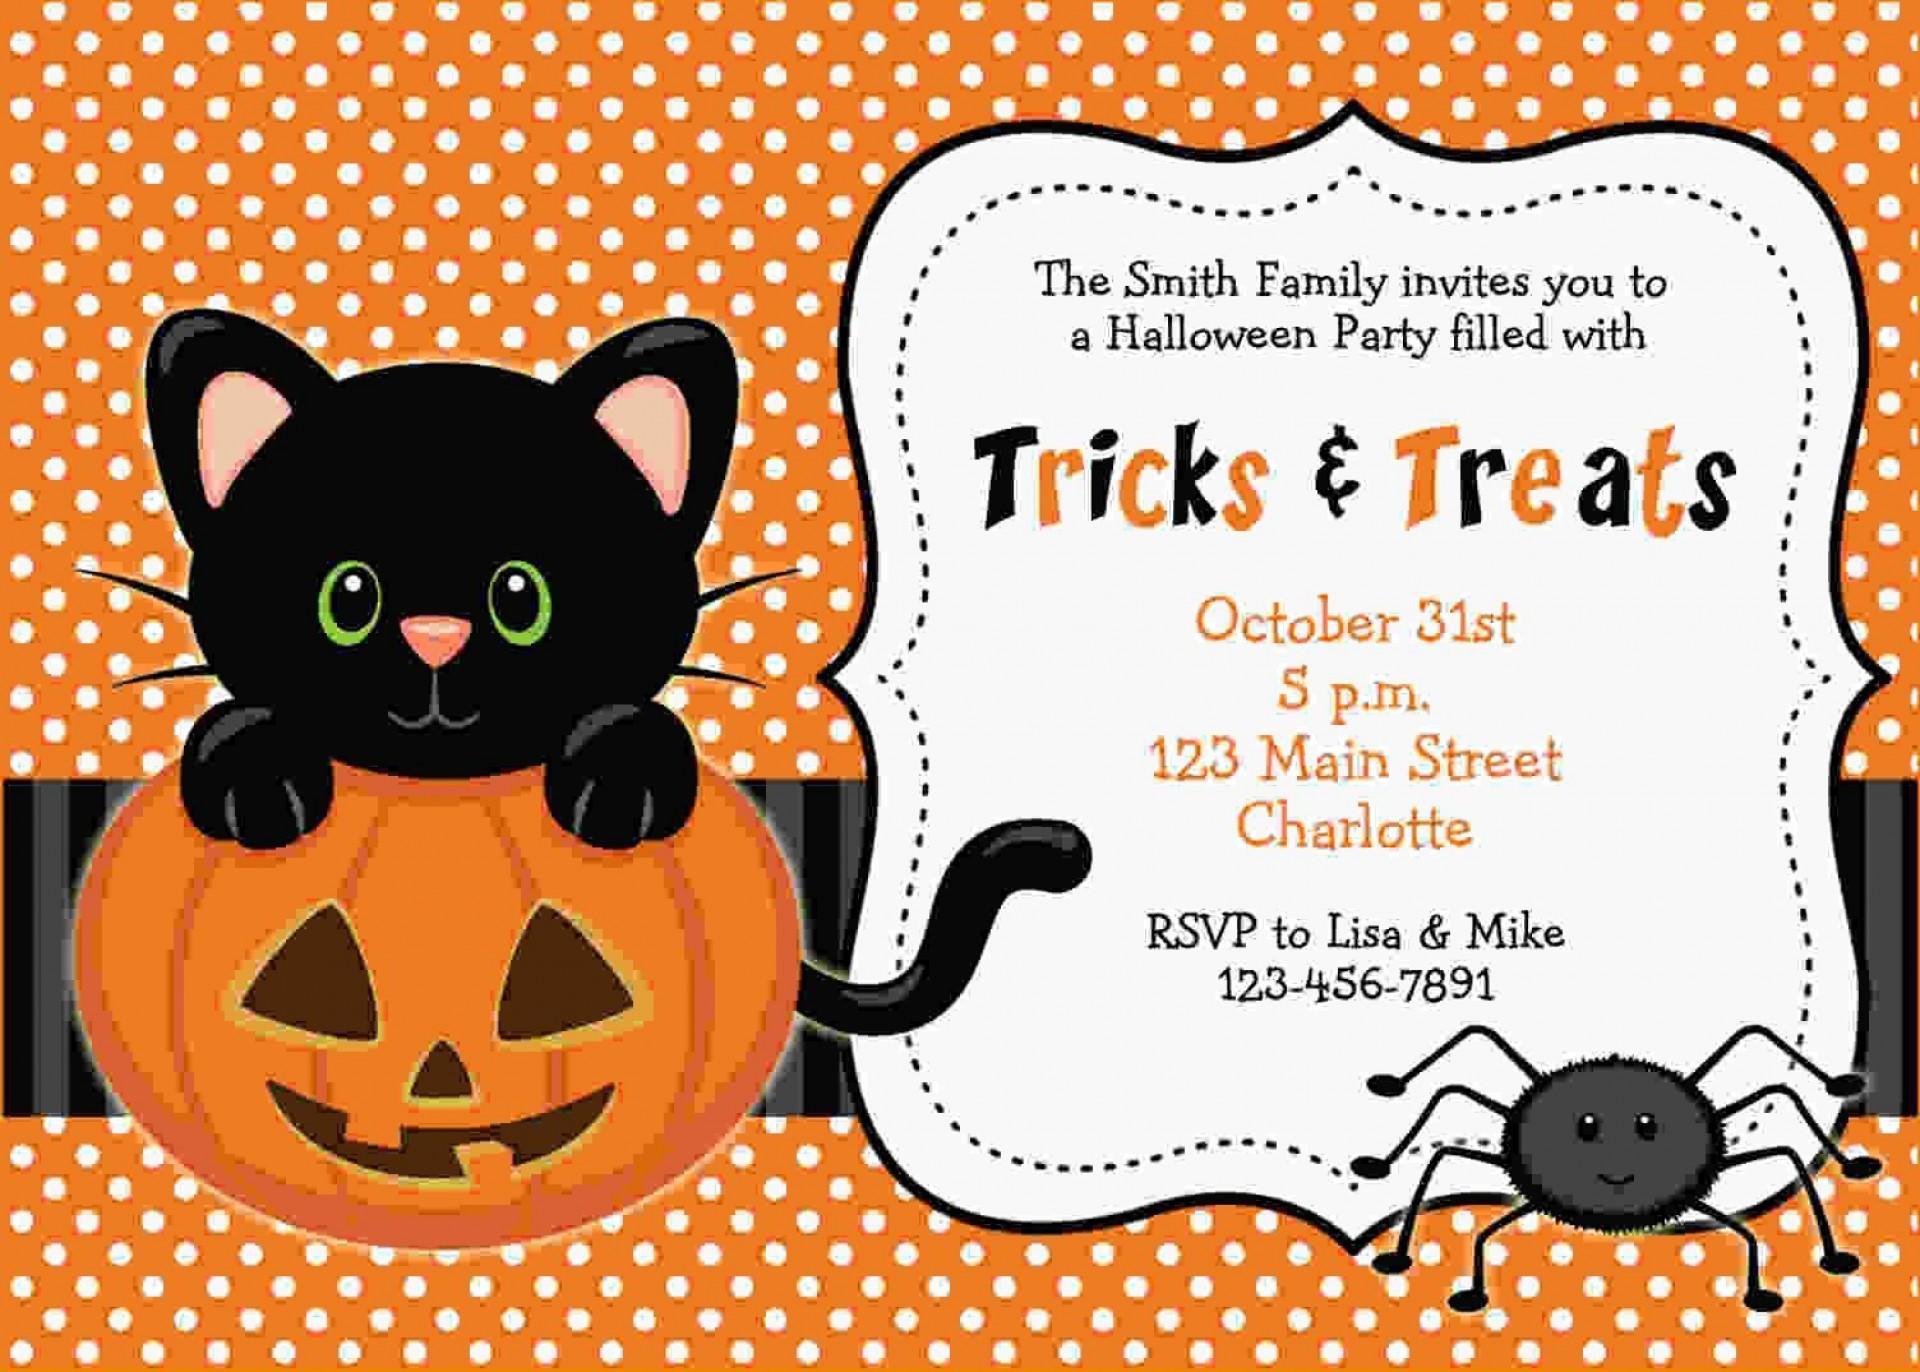 005 Sensational Halloween Party Invite Template Idea  Templates - Free Printable Spooky Invitation Birthday1920